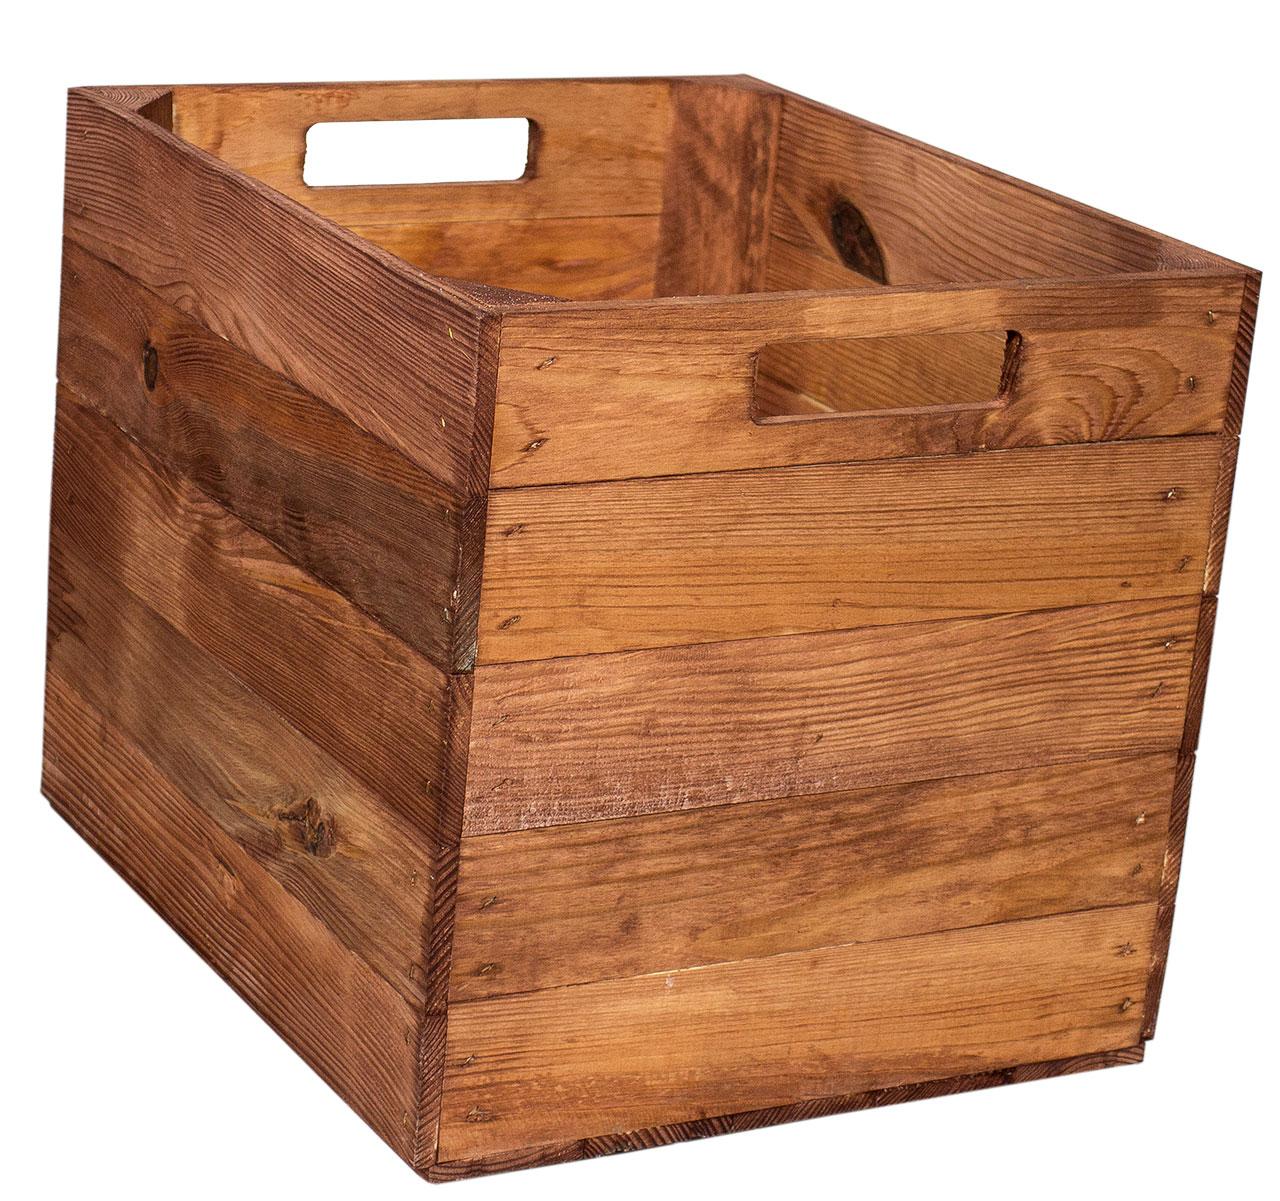 Lackiertes Holz Holzkiste Used Fur Kallax Regale 33x37 5x32 5cm